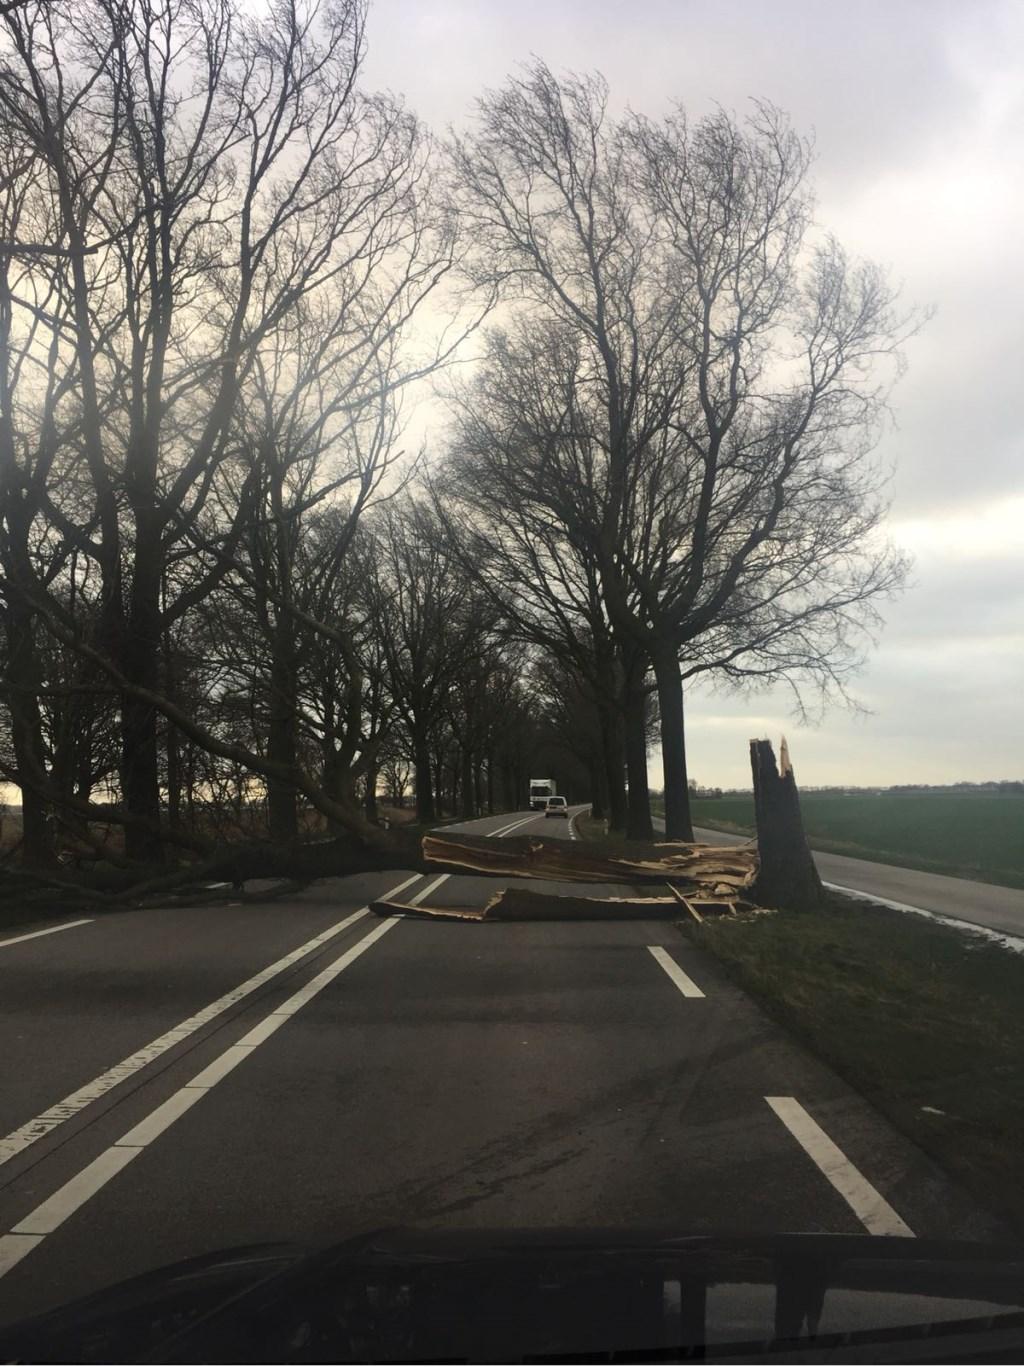 Middenpeelweg Foto: DeMooiUdenKrant © MooiUden